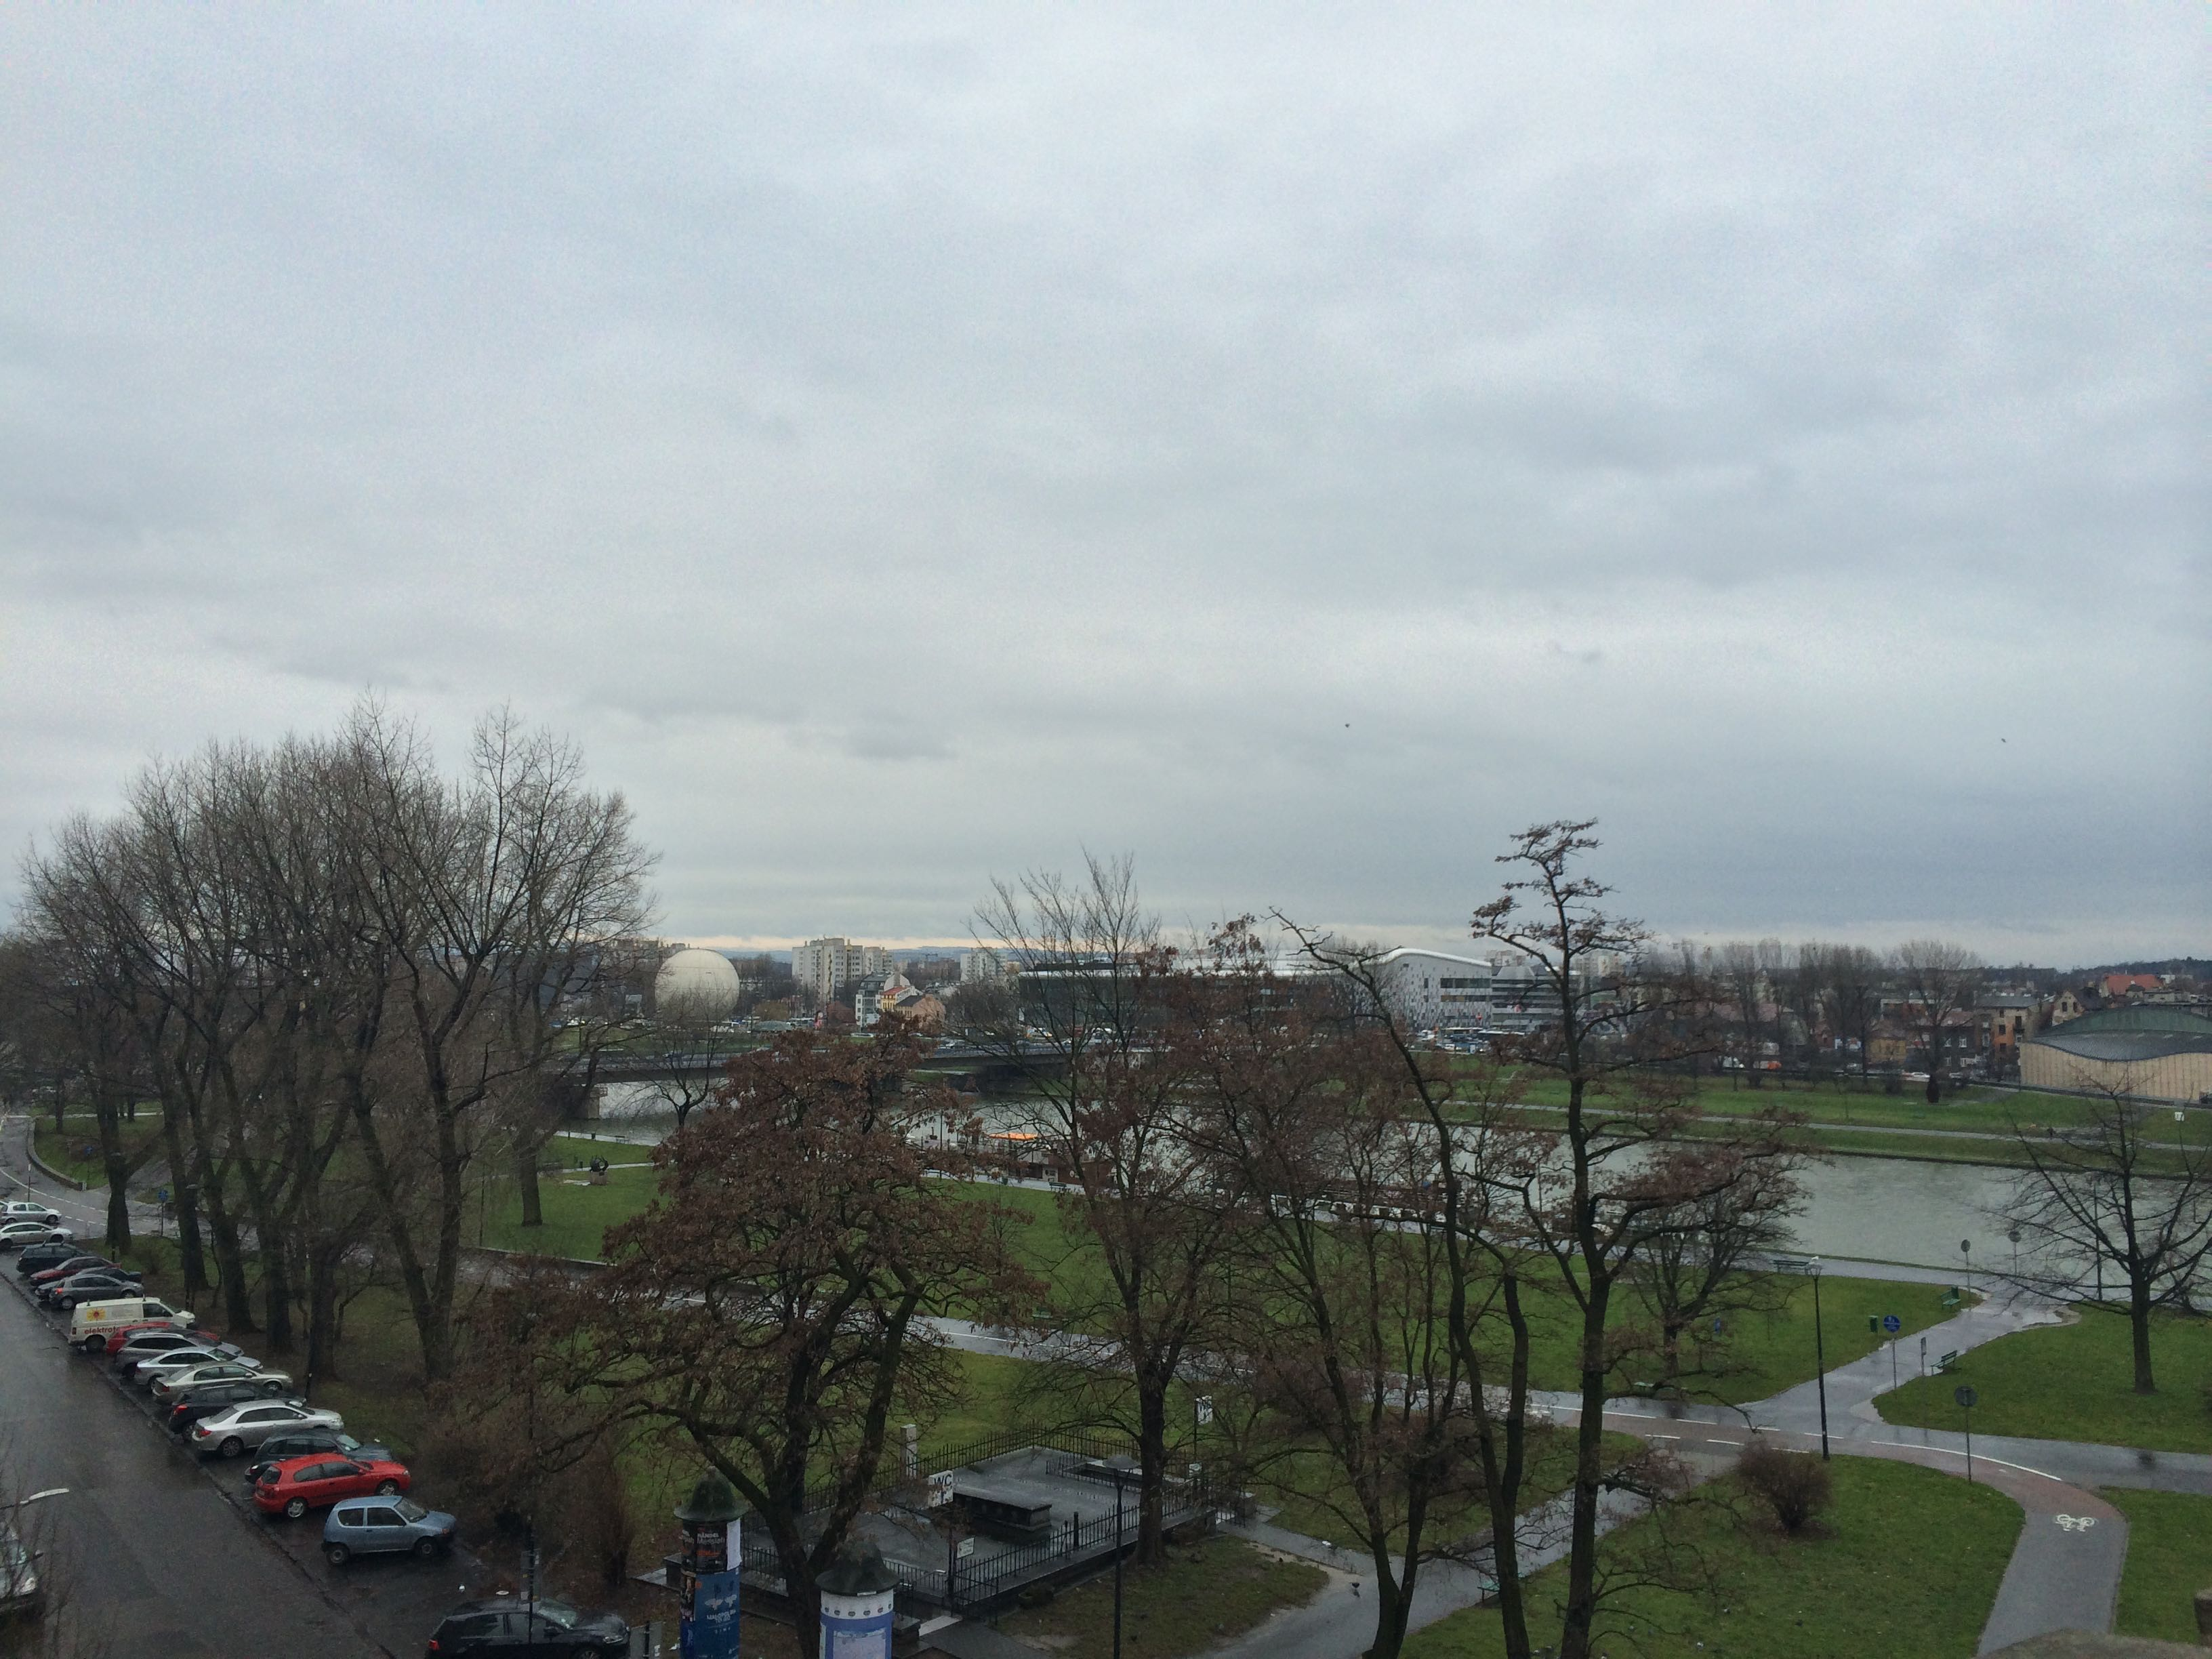 Muita ventania nas margens do rio Vístula. (Foto: Nathalia Tavolieri)